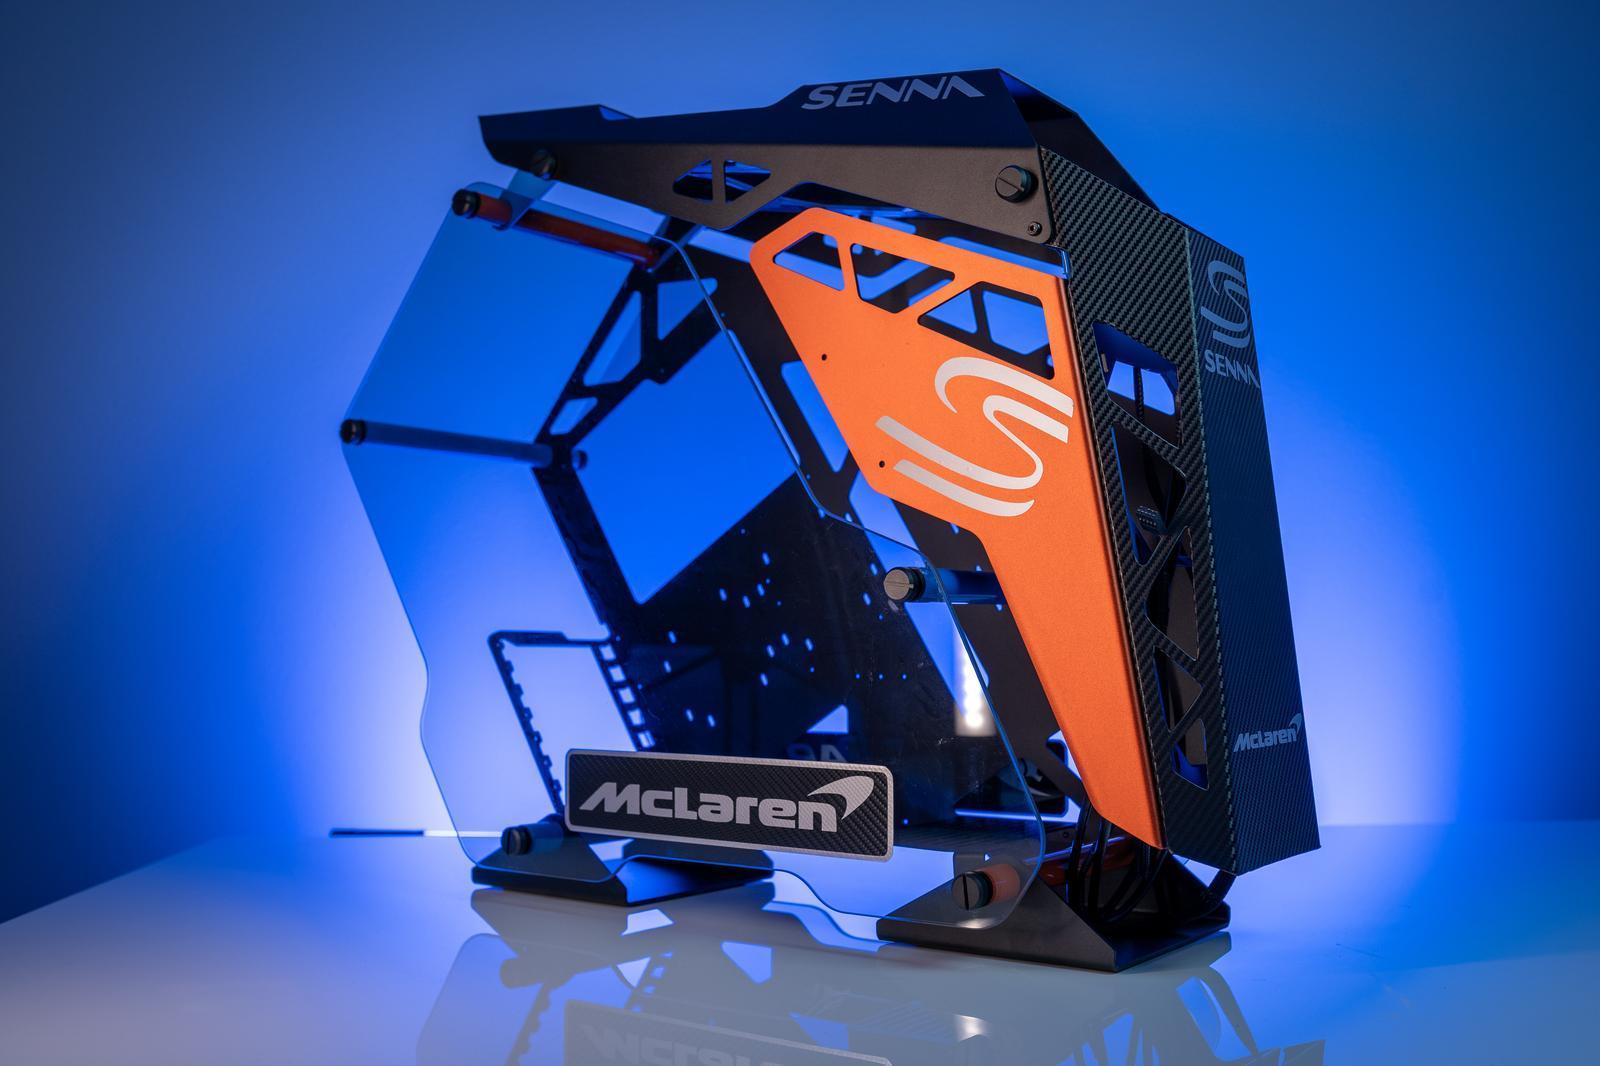 McLaren Senna PC blauw zij